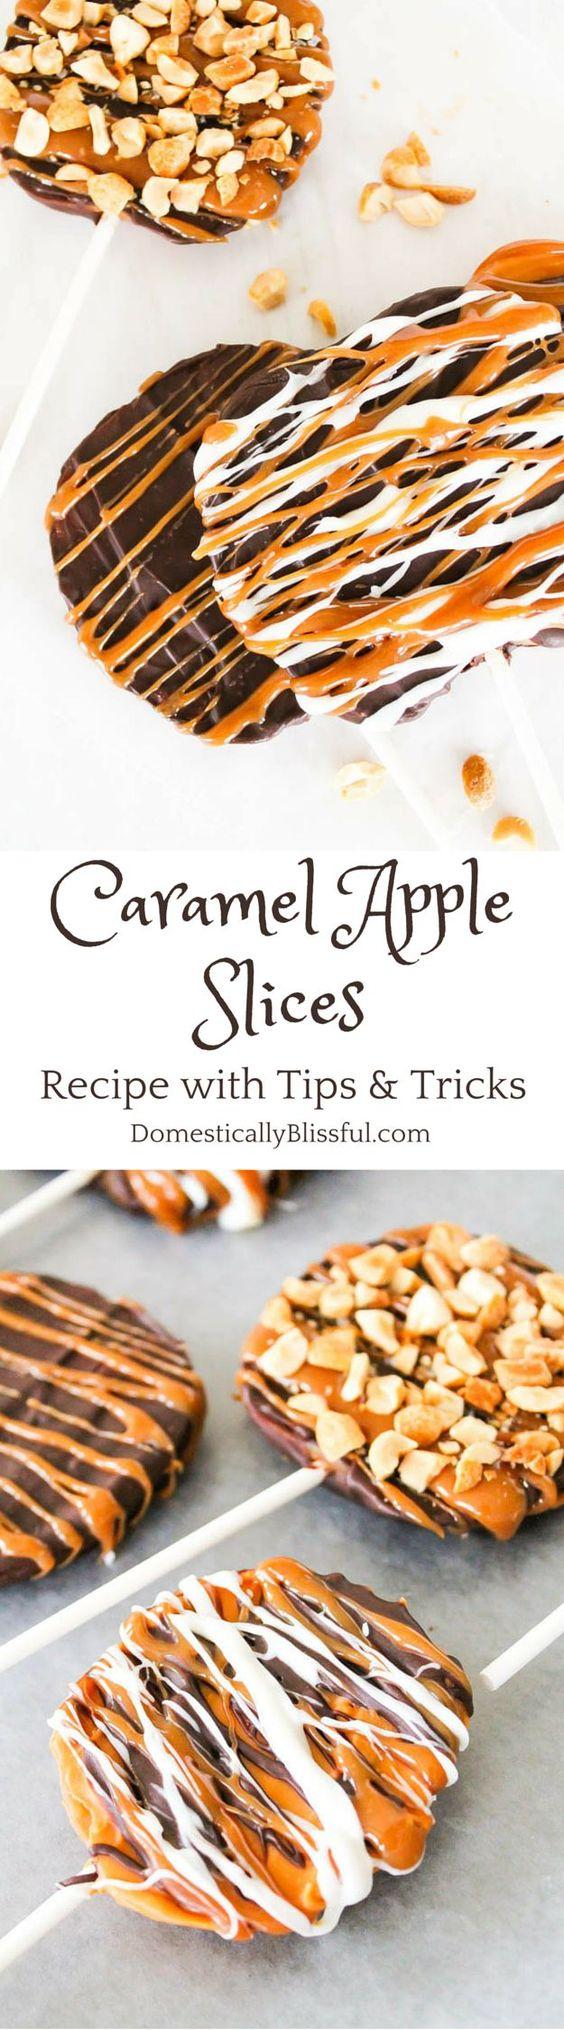 Thanksgiving Desserts: Caramel Apple Slices